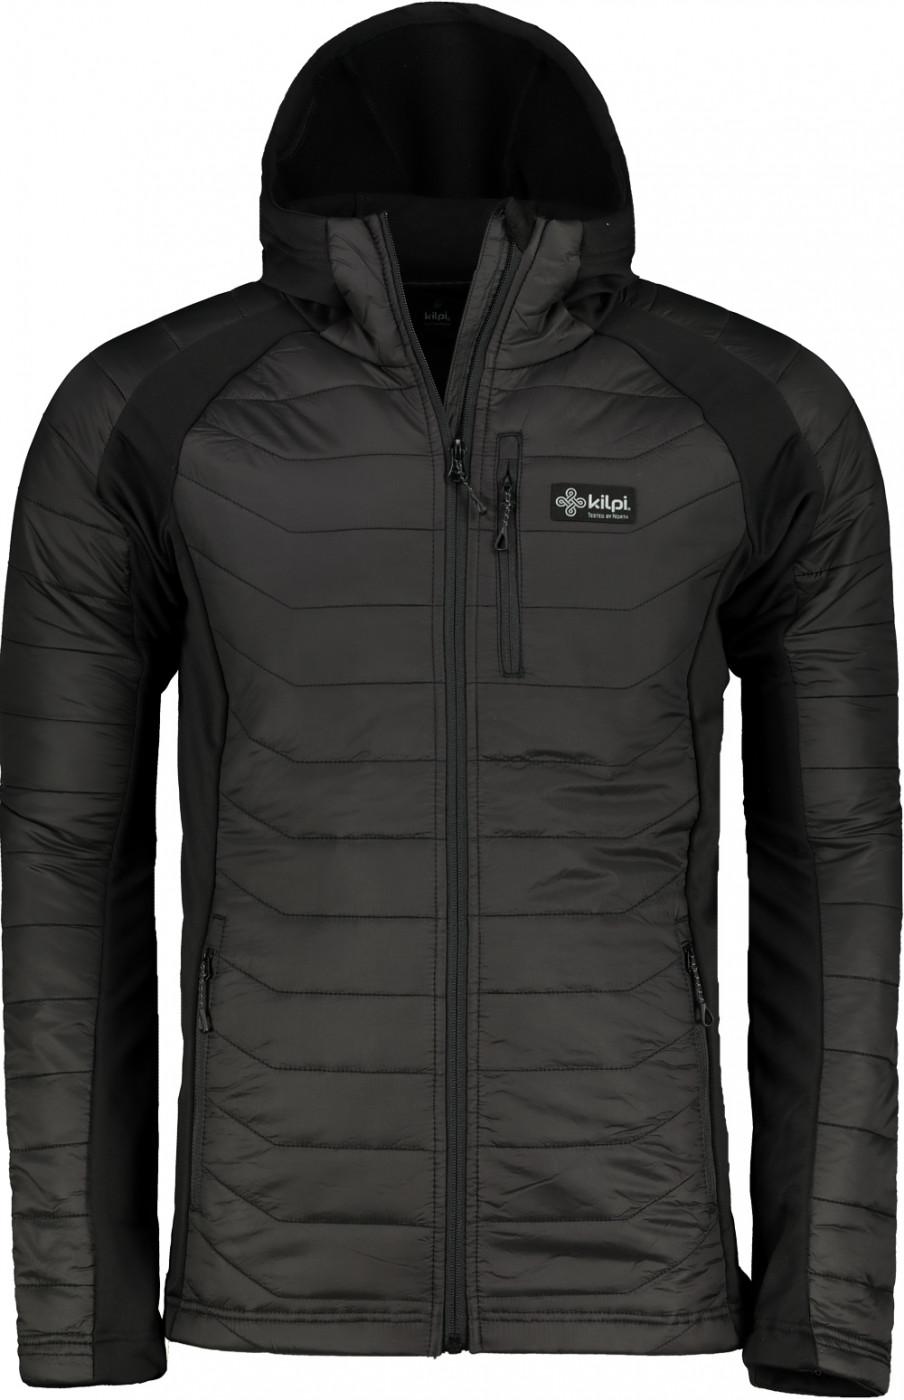 Men's jacket Kilpi ADISA-M